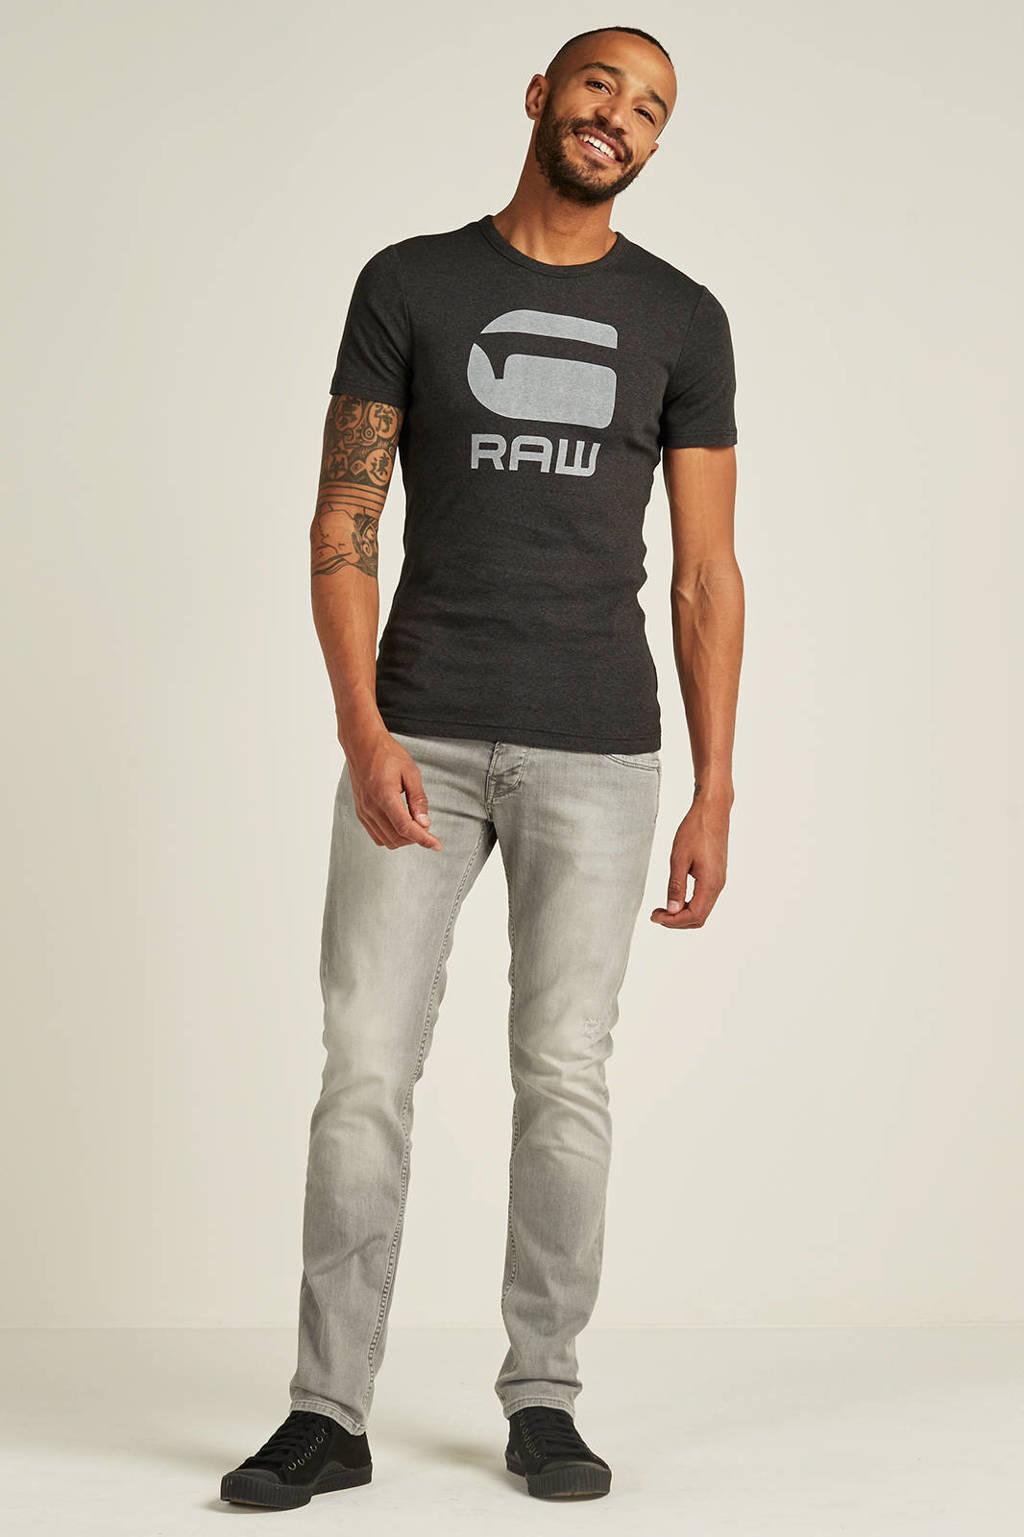 G-Star RAW Drillon T-shirt, Antraciet/grijs